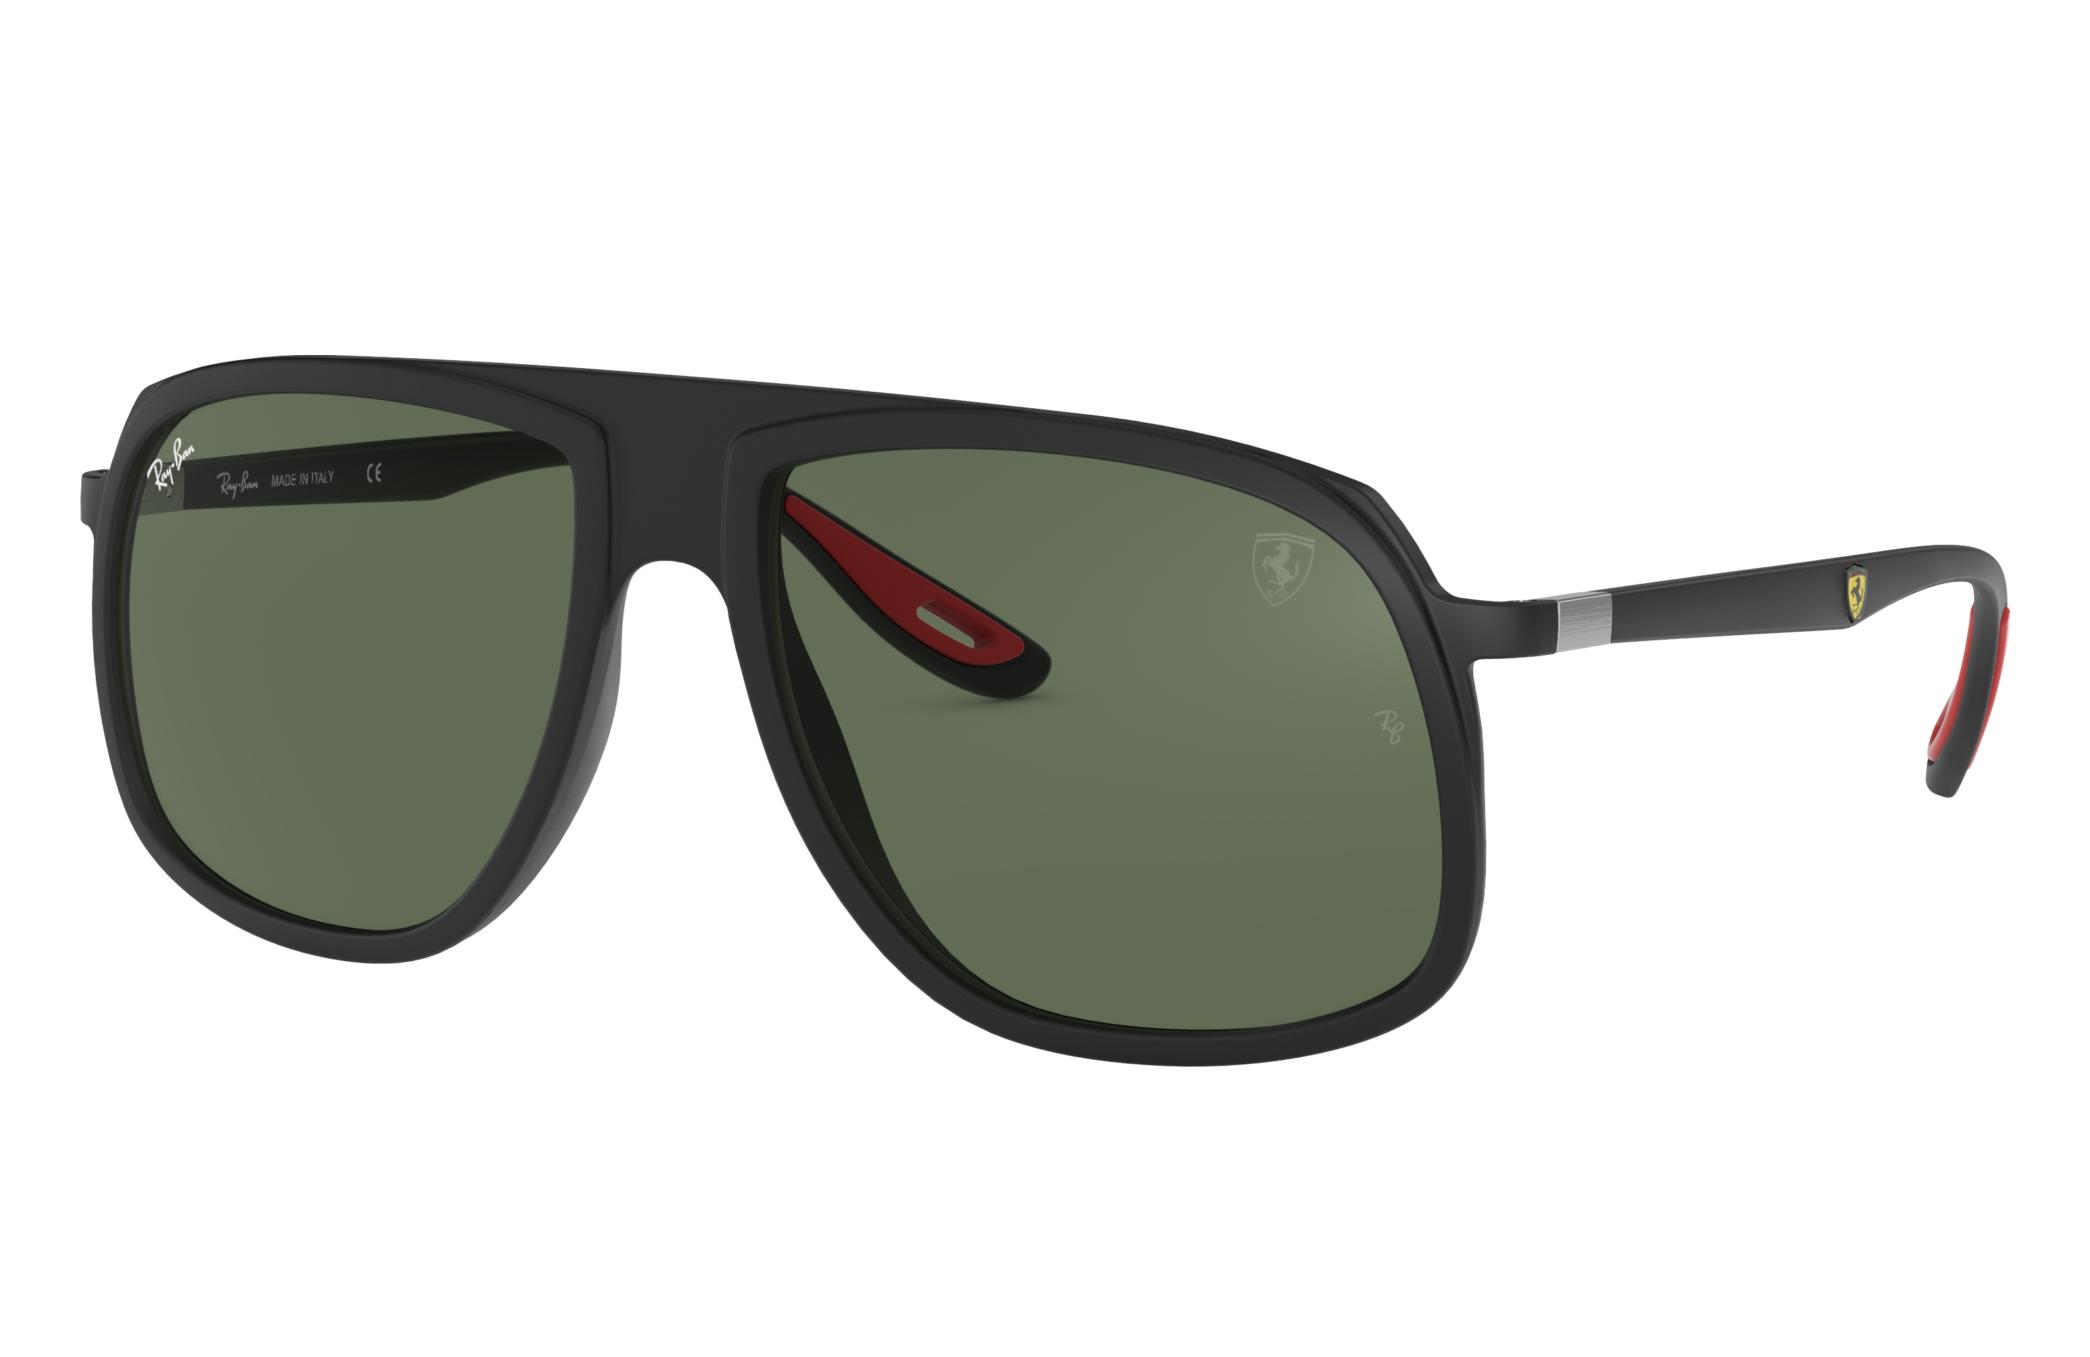 Ray-Ban Rb4308m Scuderia Ferrari Collection Black, Green Lenses - RB4308M